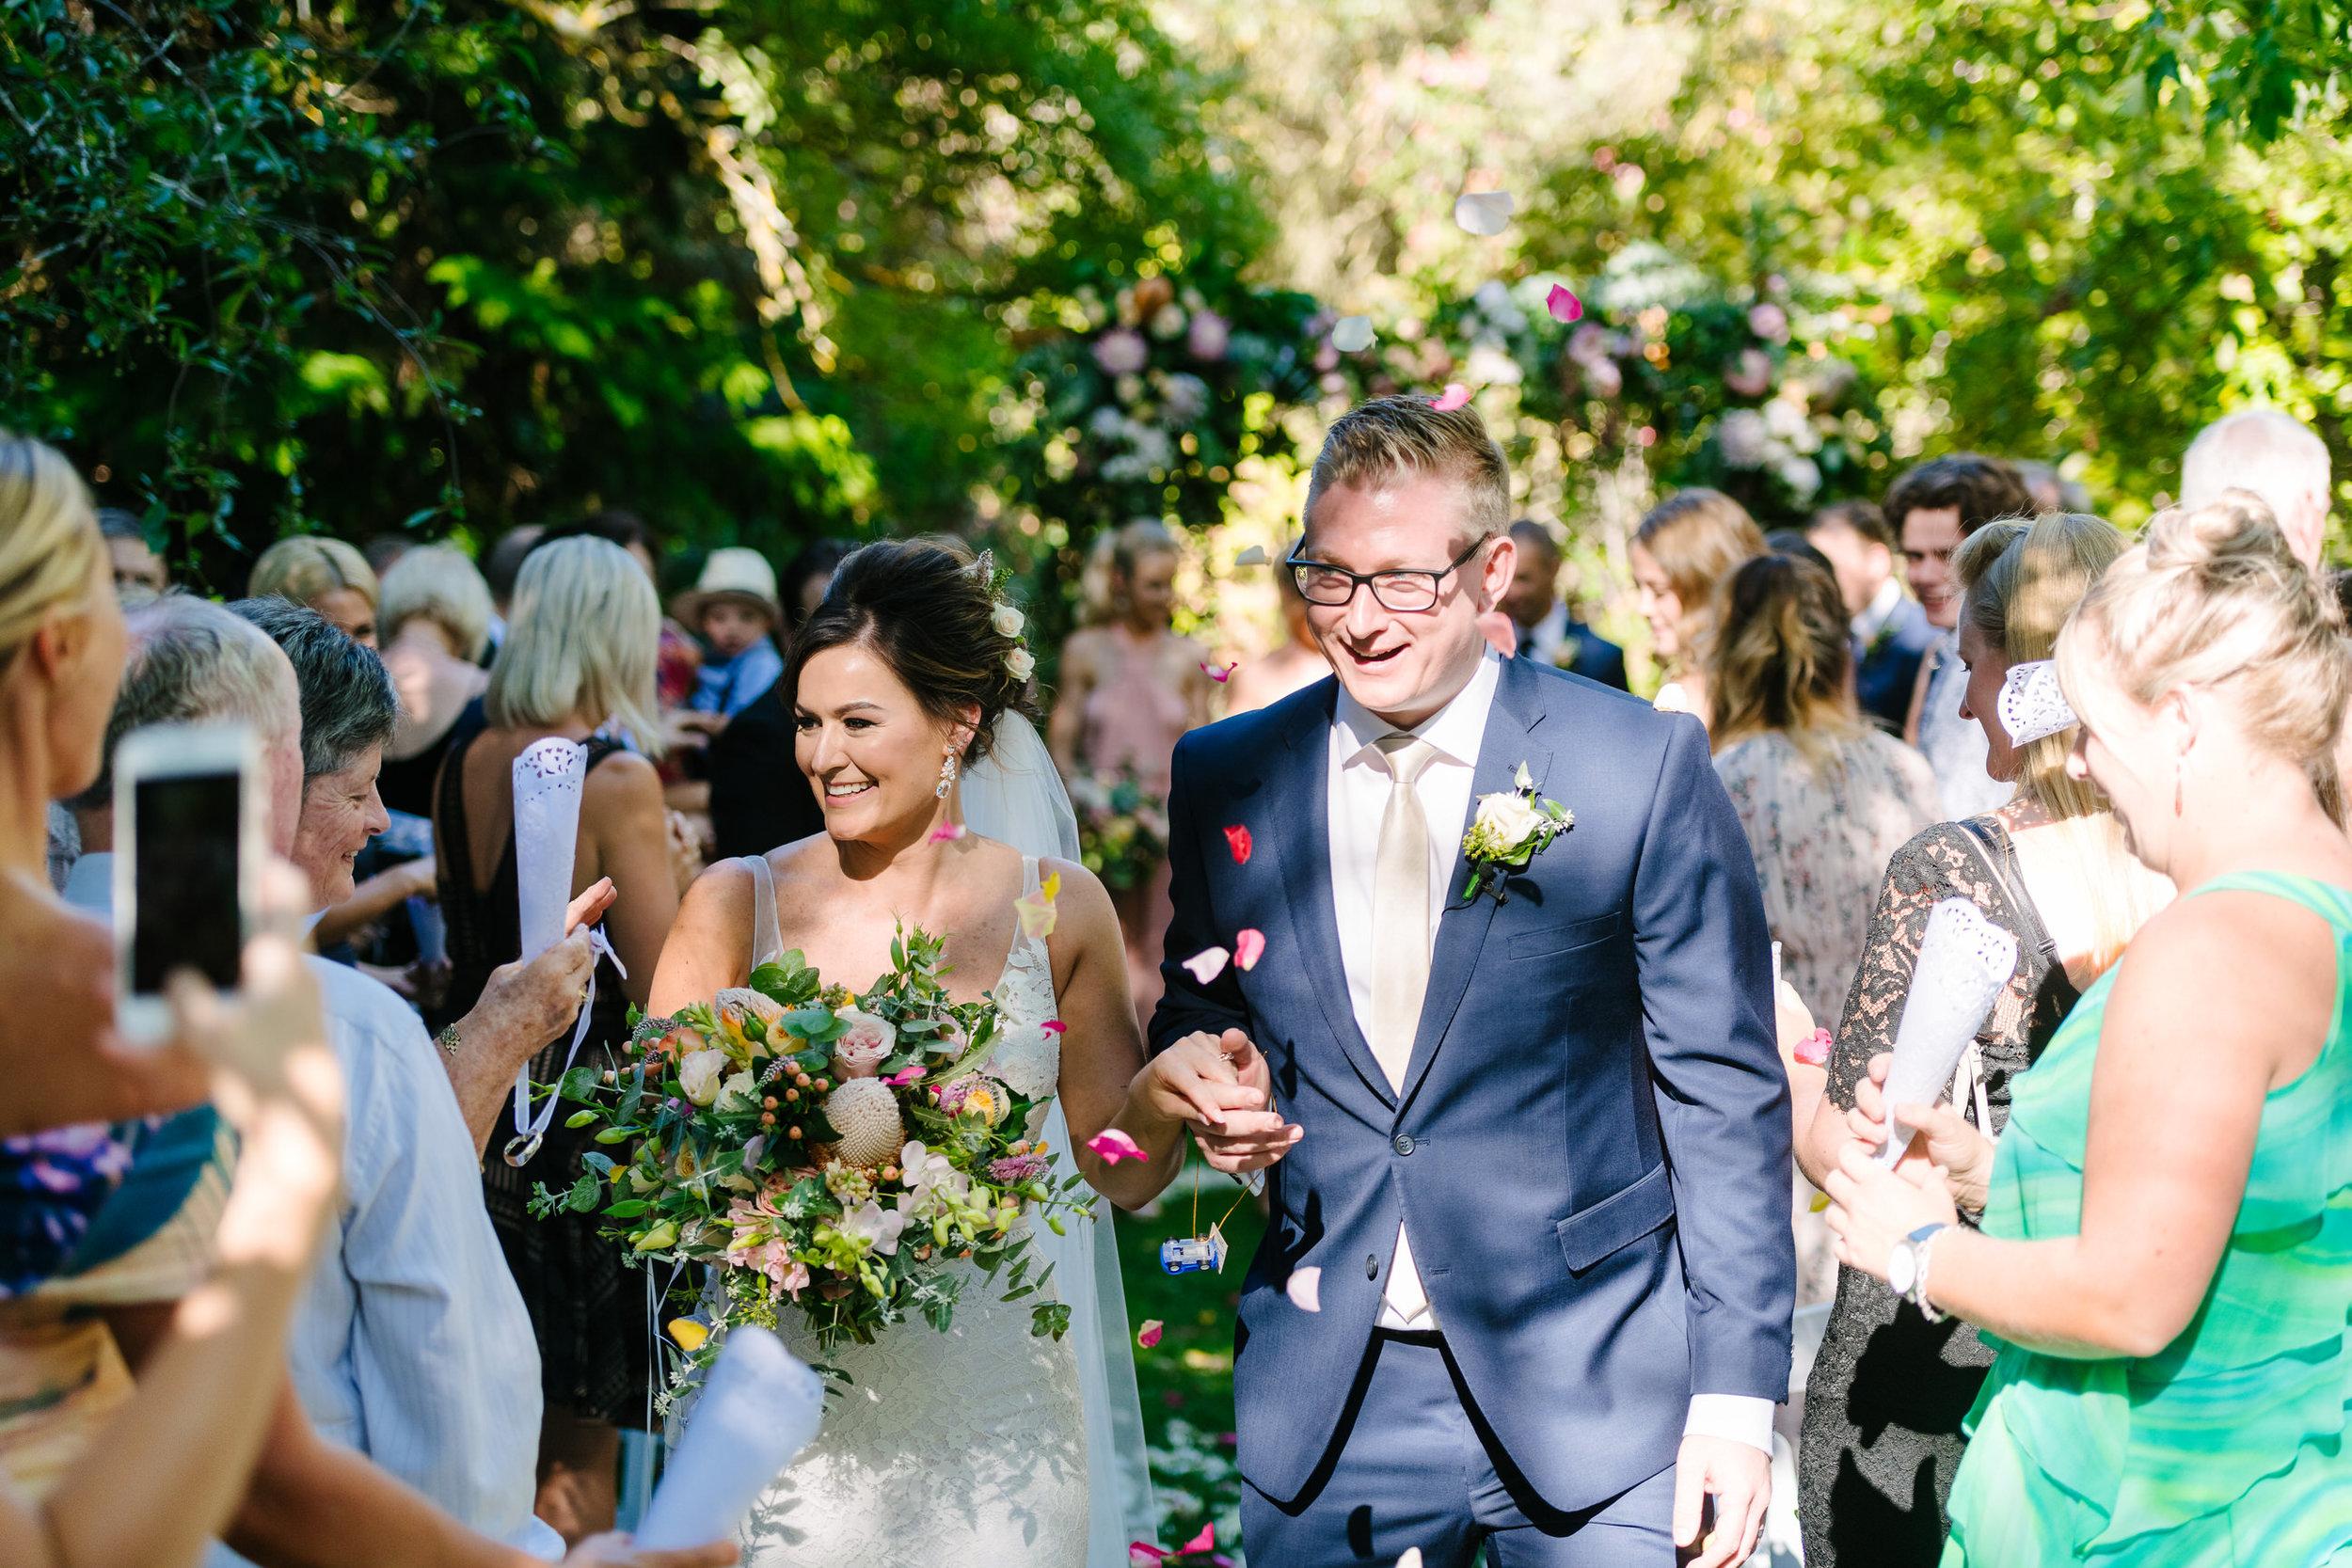 Justin_And_Jim_Photography_Chateau_Dore_Bendigo_Wedding47.JPG